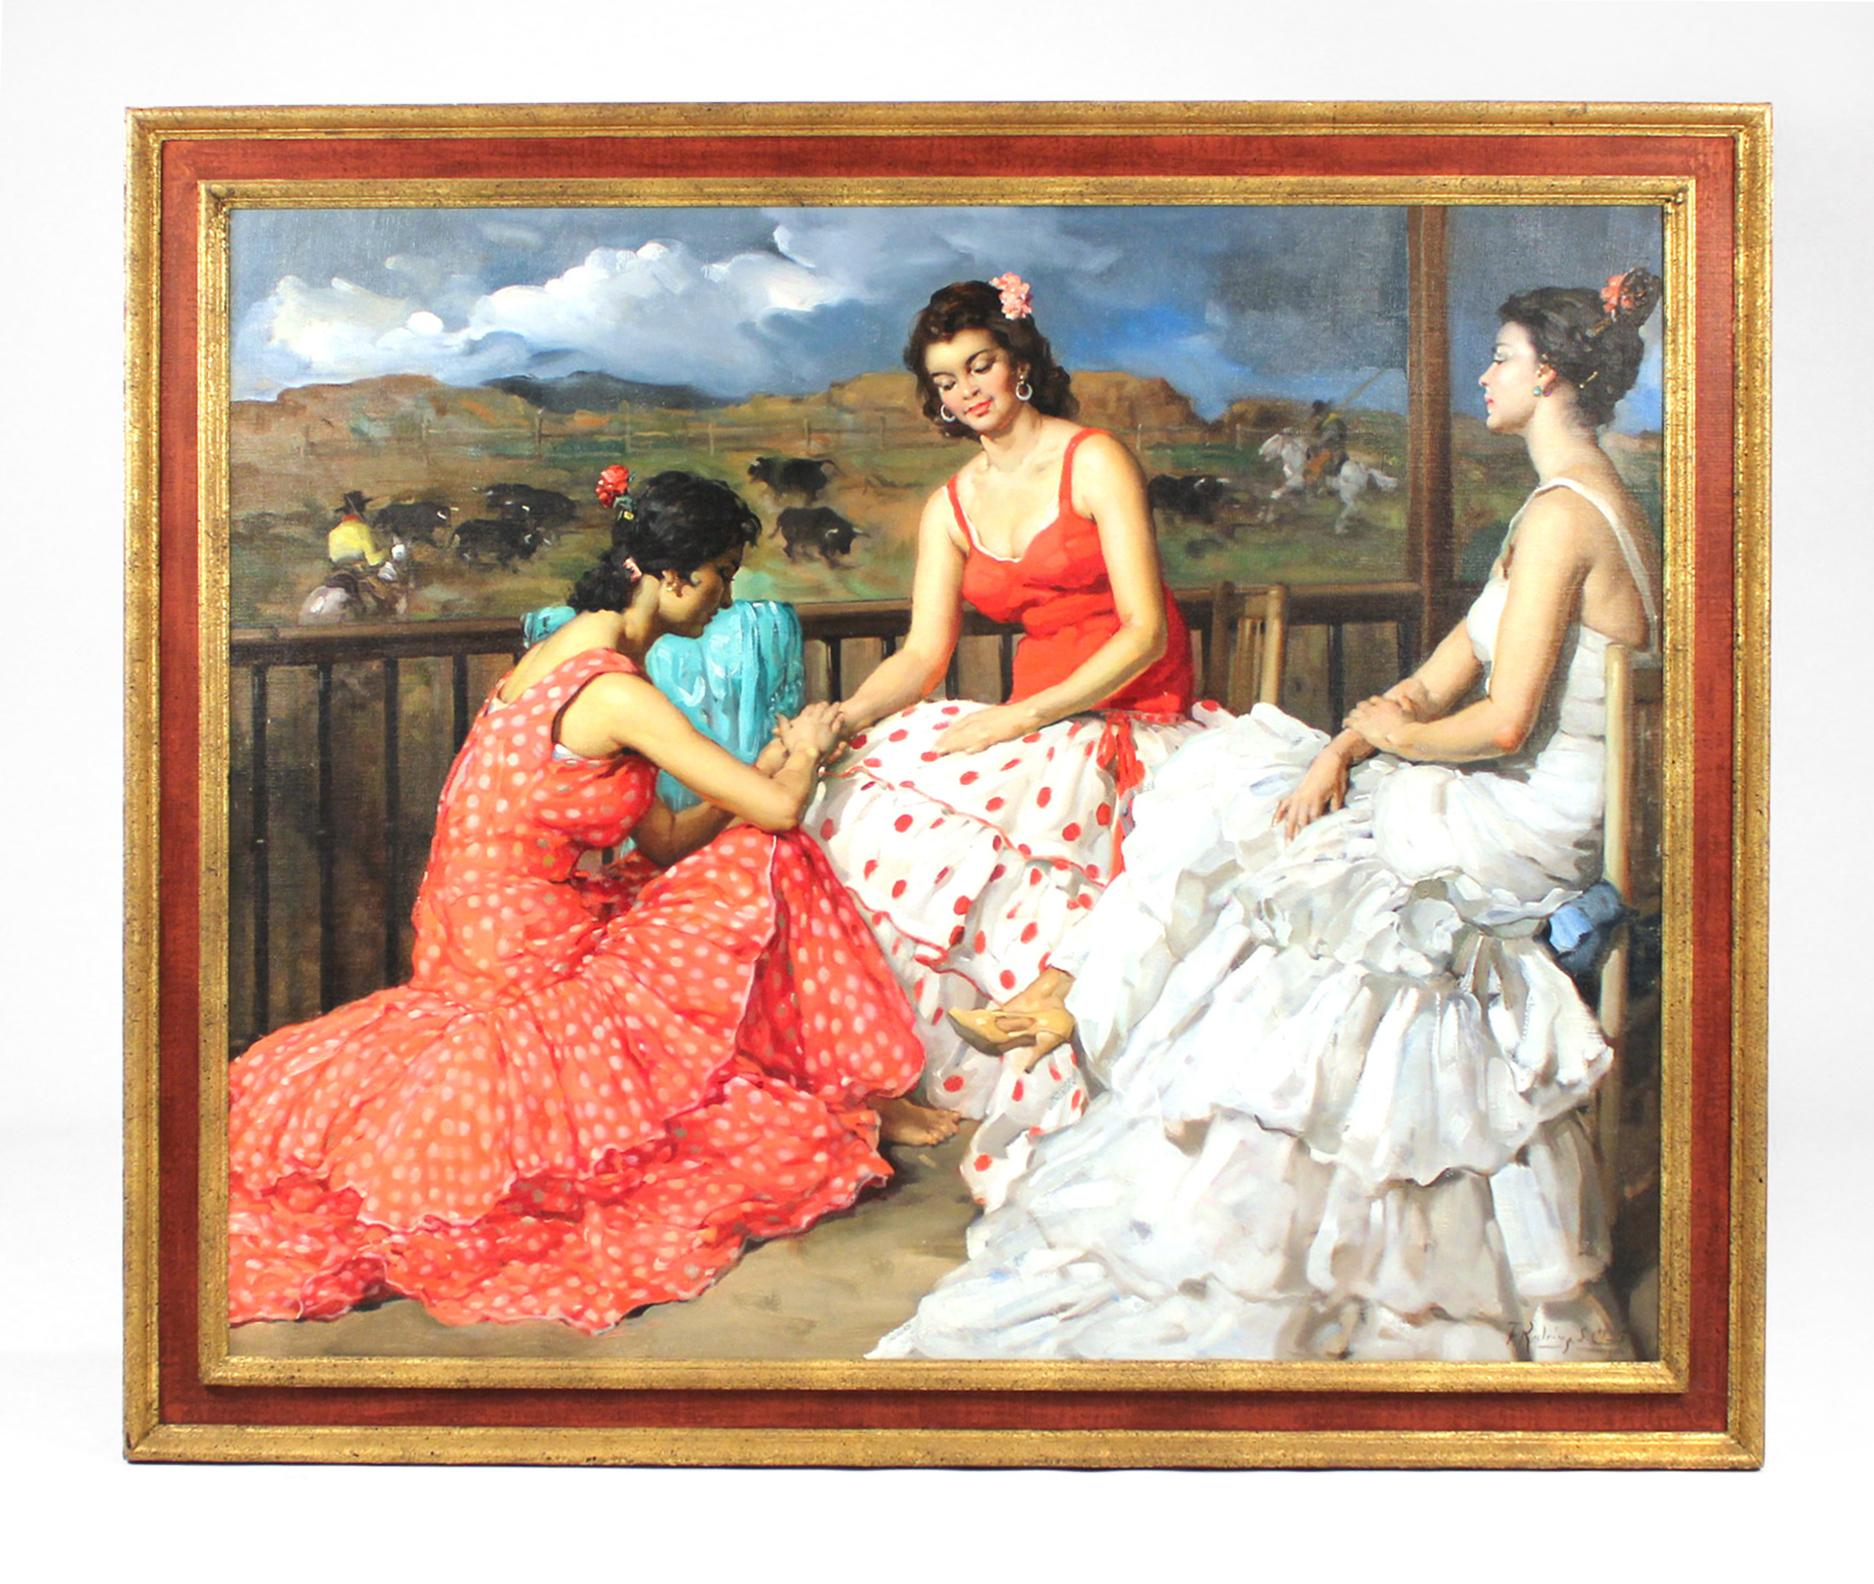 Large Francisco Rodriguez San Clemente Oil Painting